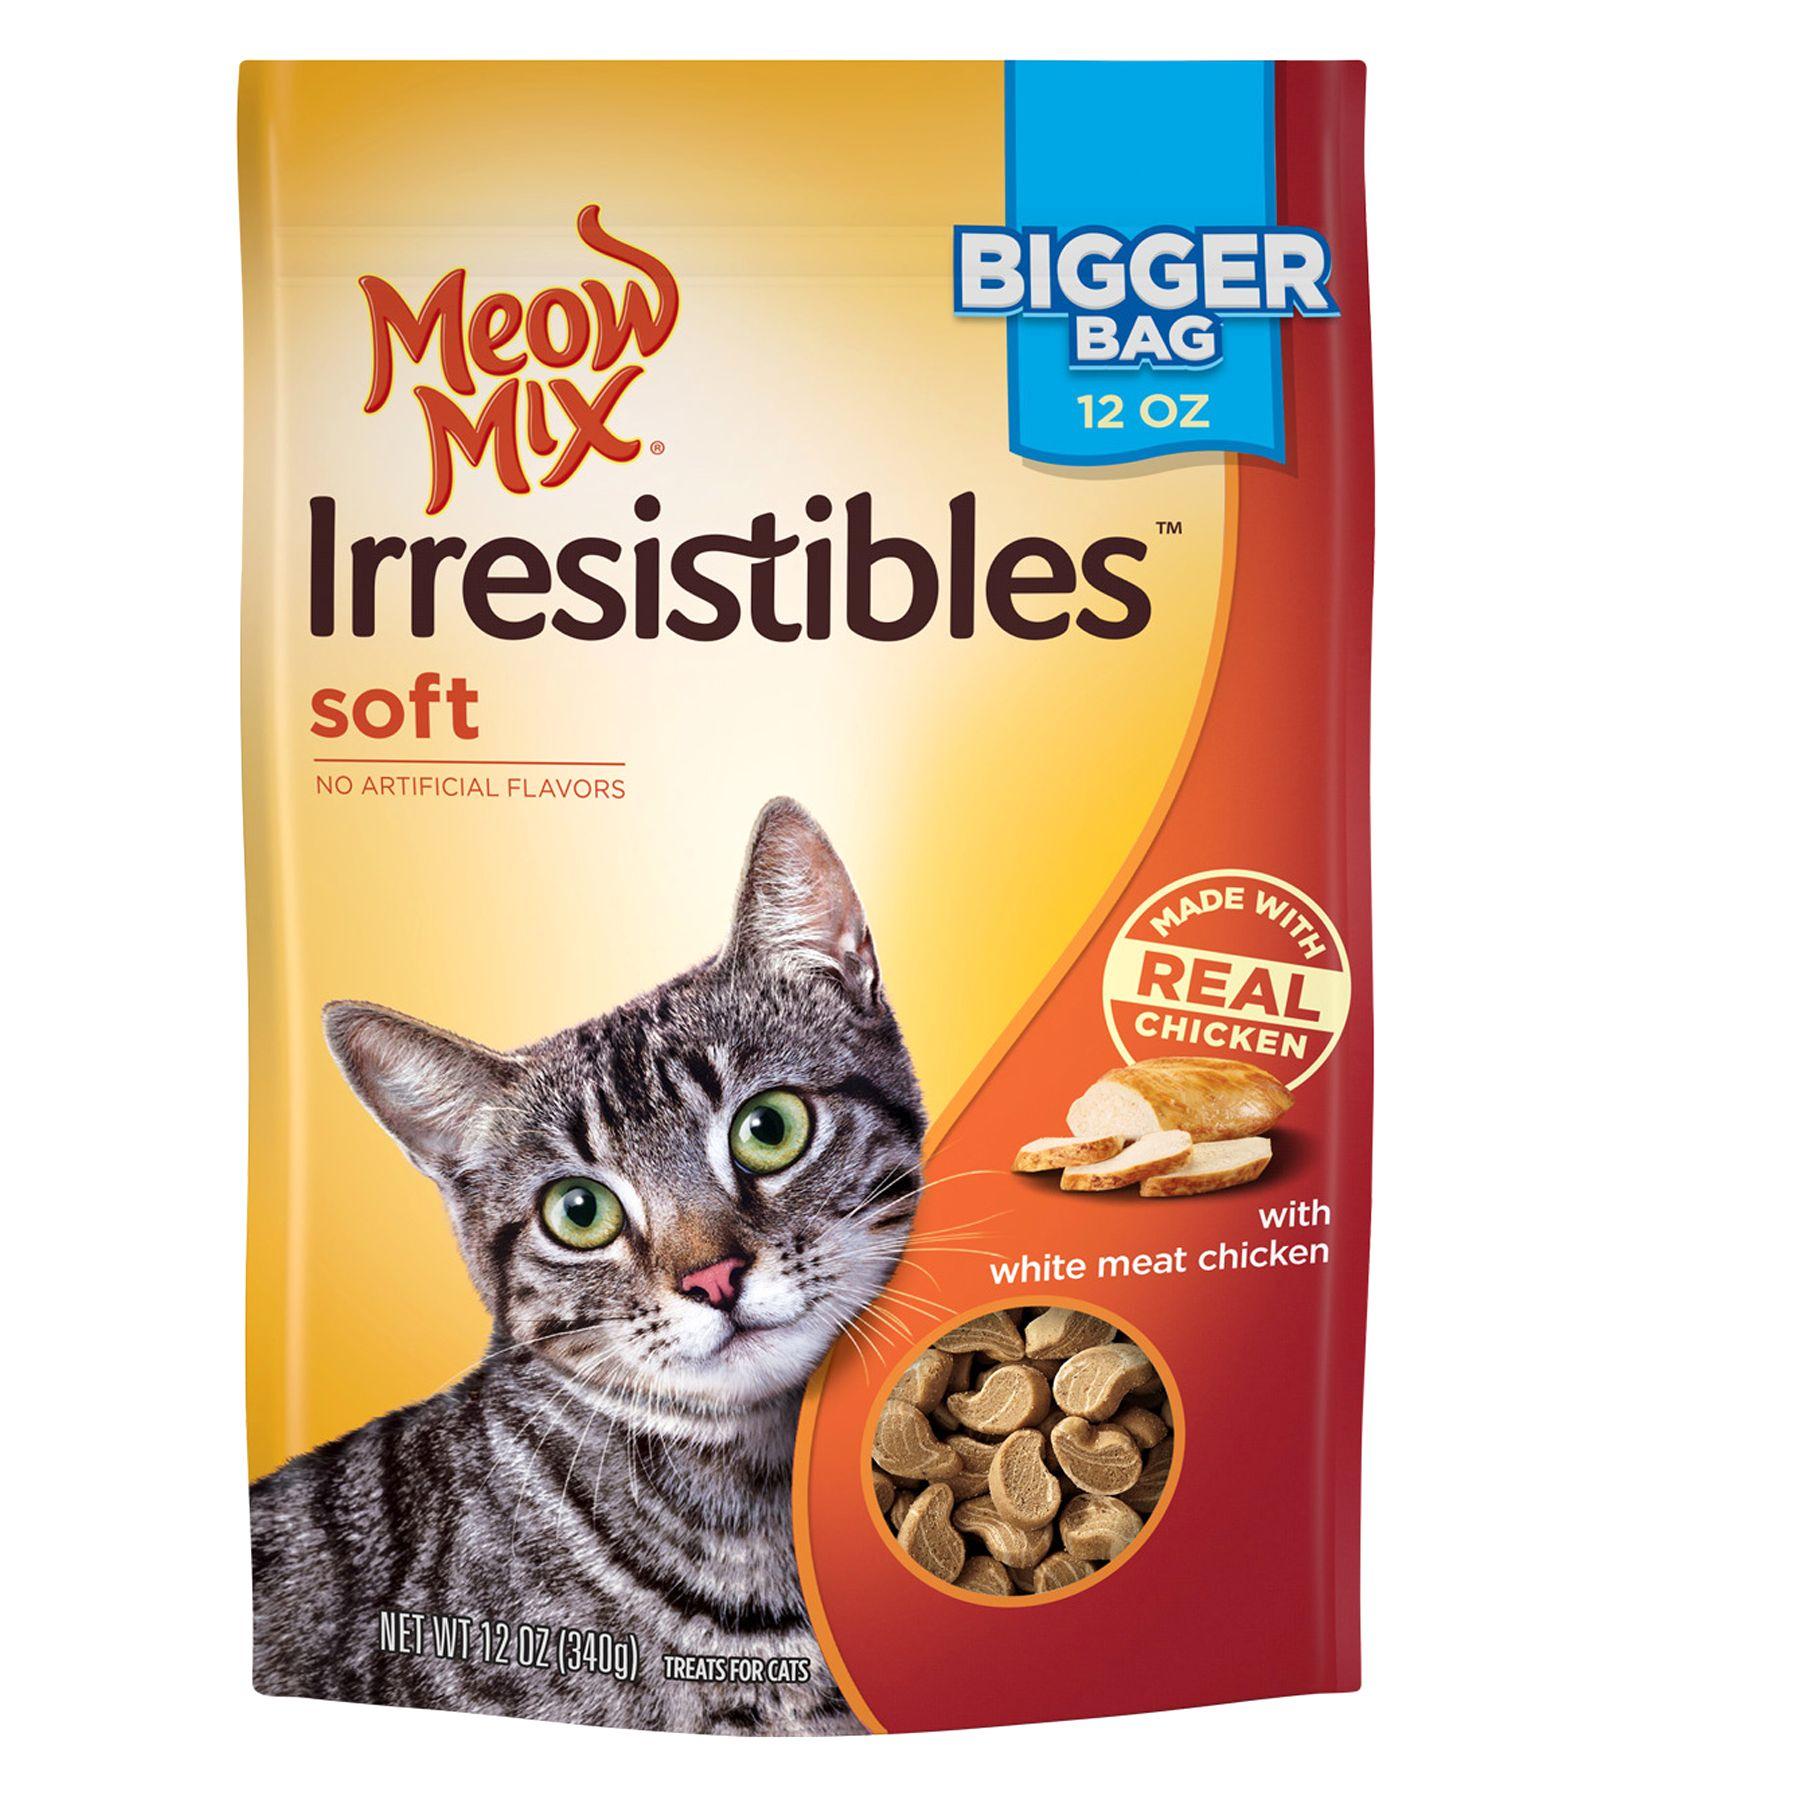 Meow Mix® Irresistibles Soft Cat Treat - Chicken size: 12 Oz 5247050